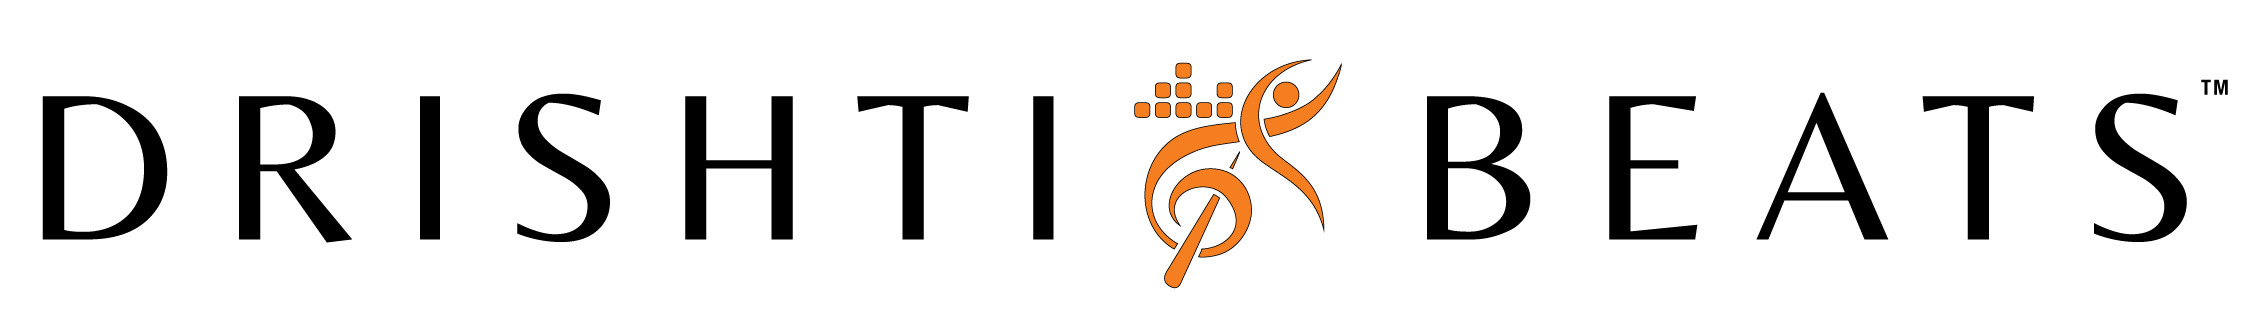 Drishti Beats logo